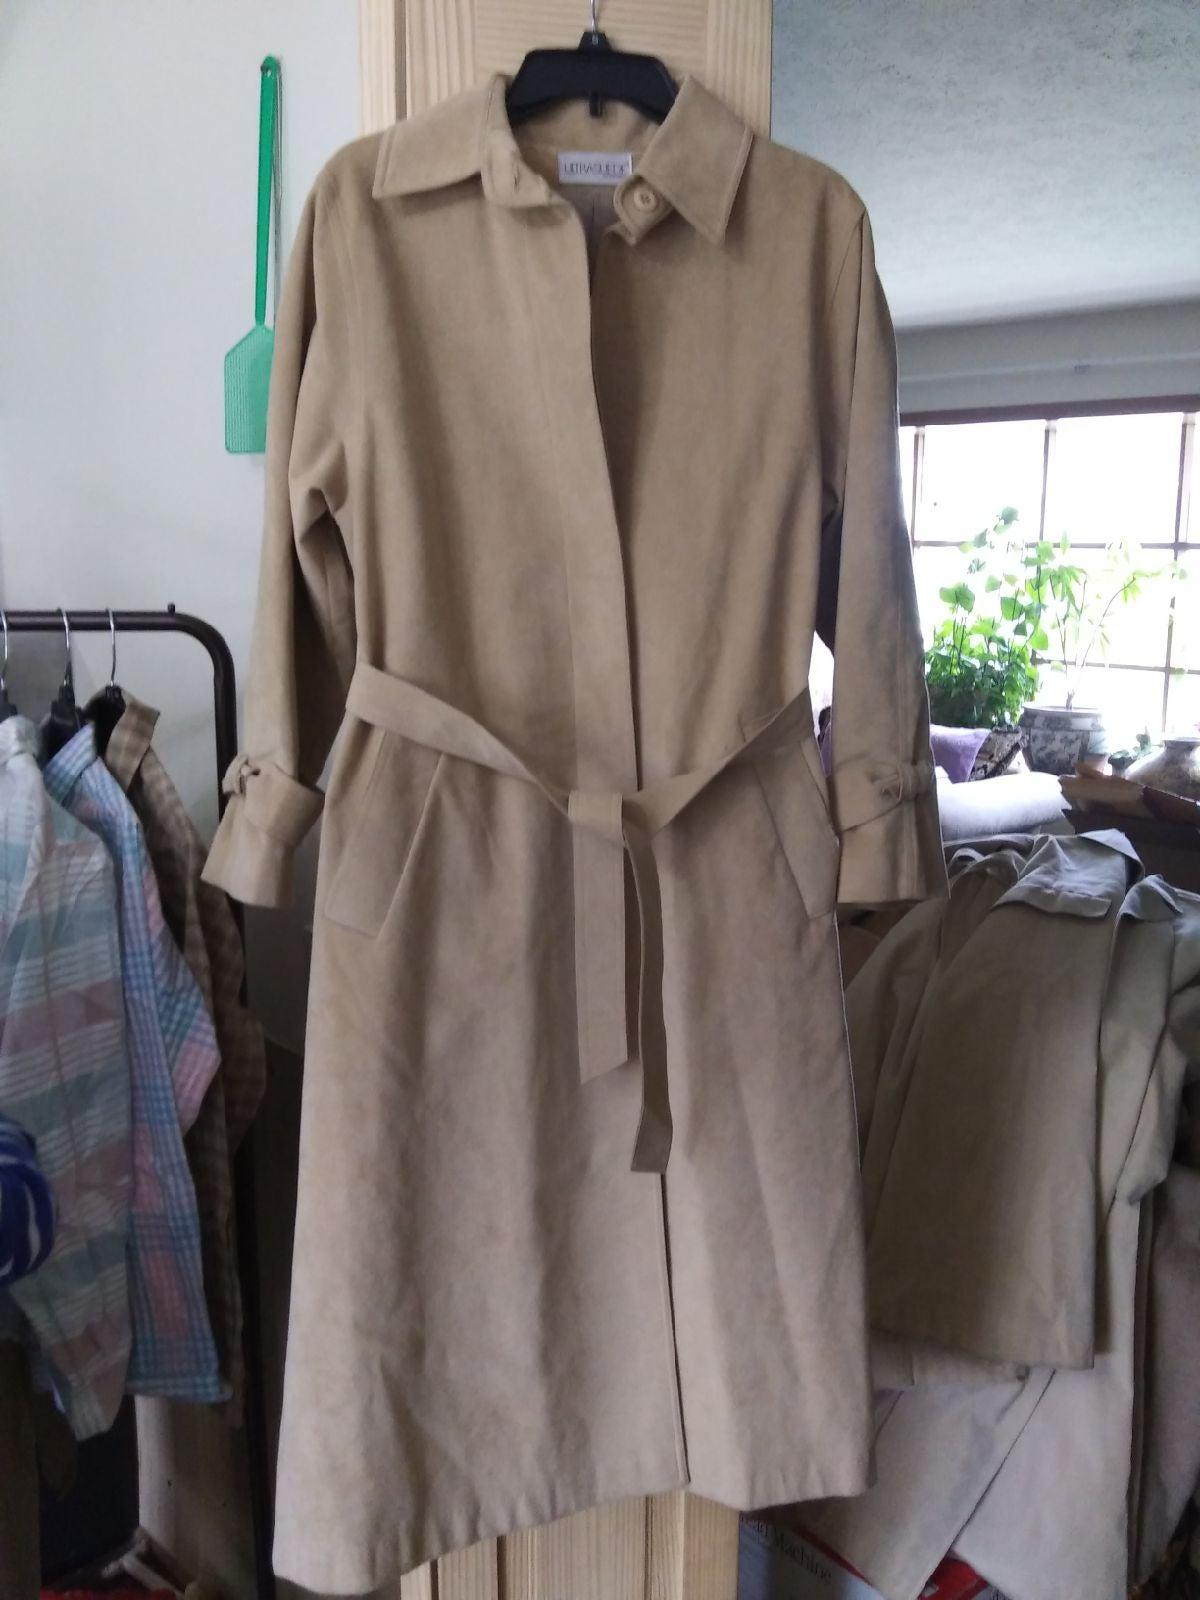 ULTRASUEDE brand fabric